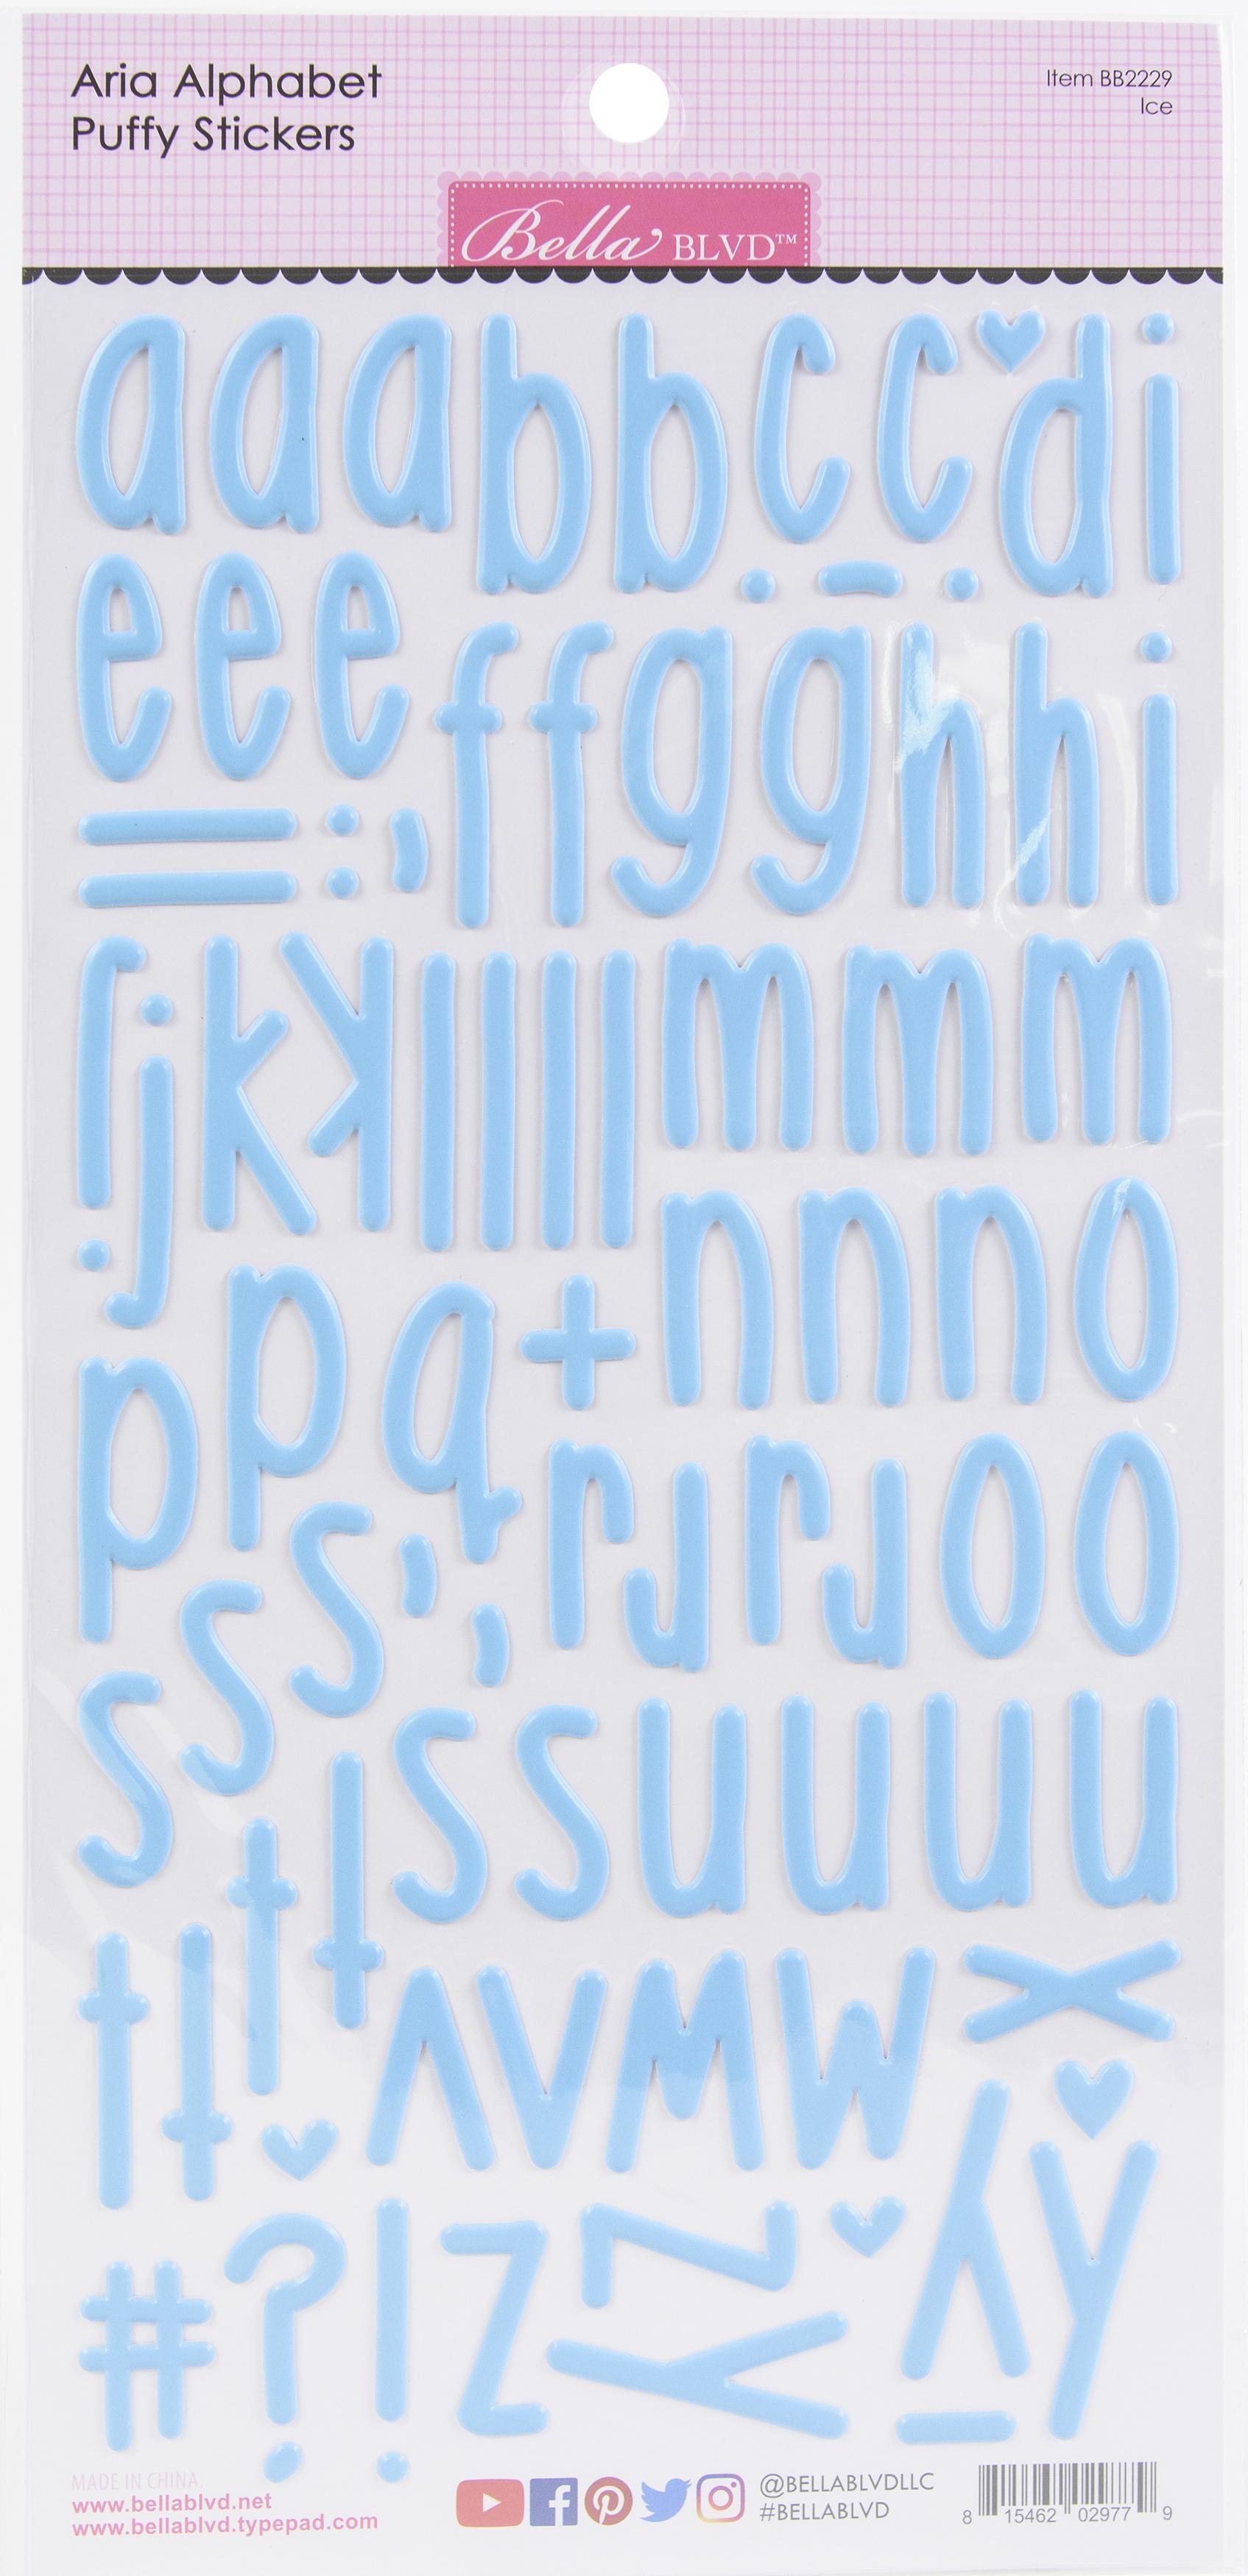 Aria Alpha Puffy Stickers-Ice